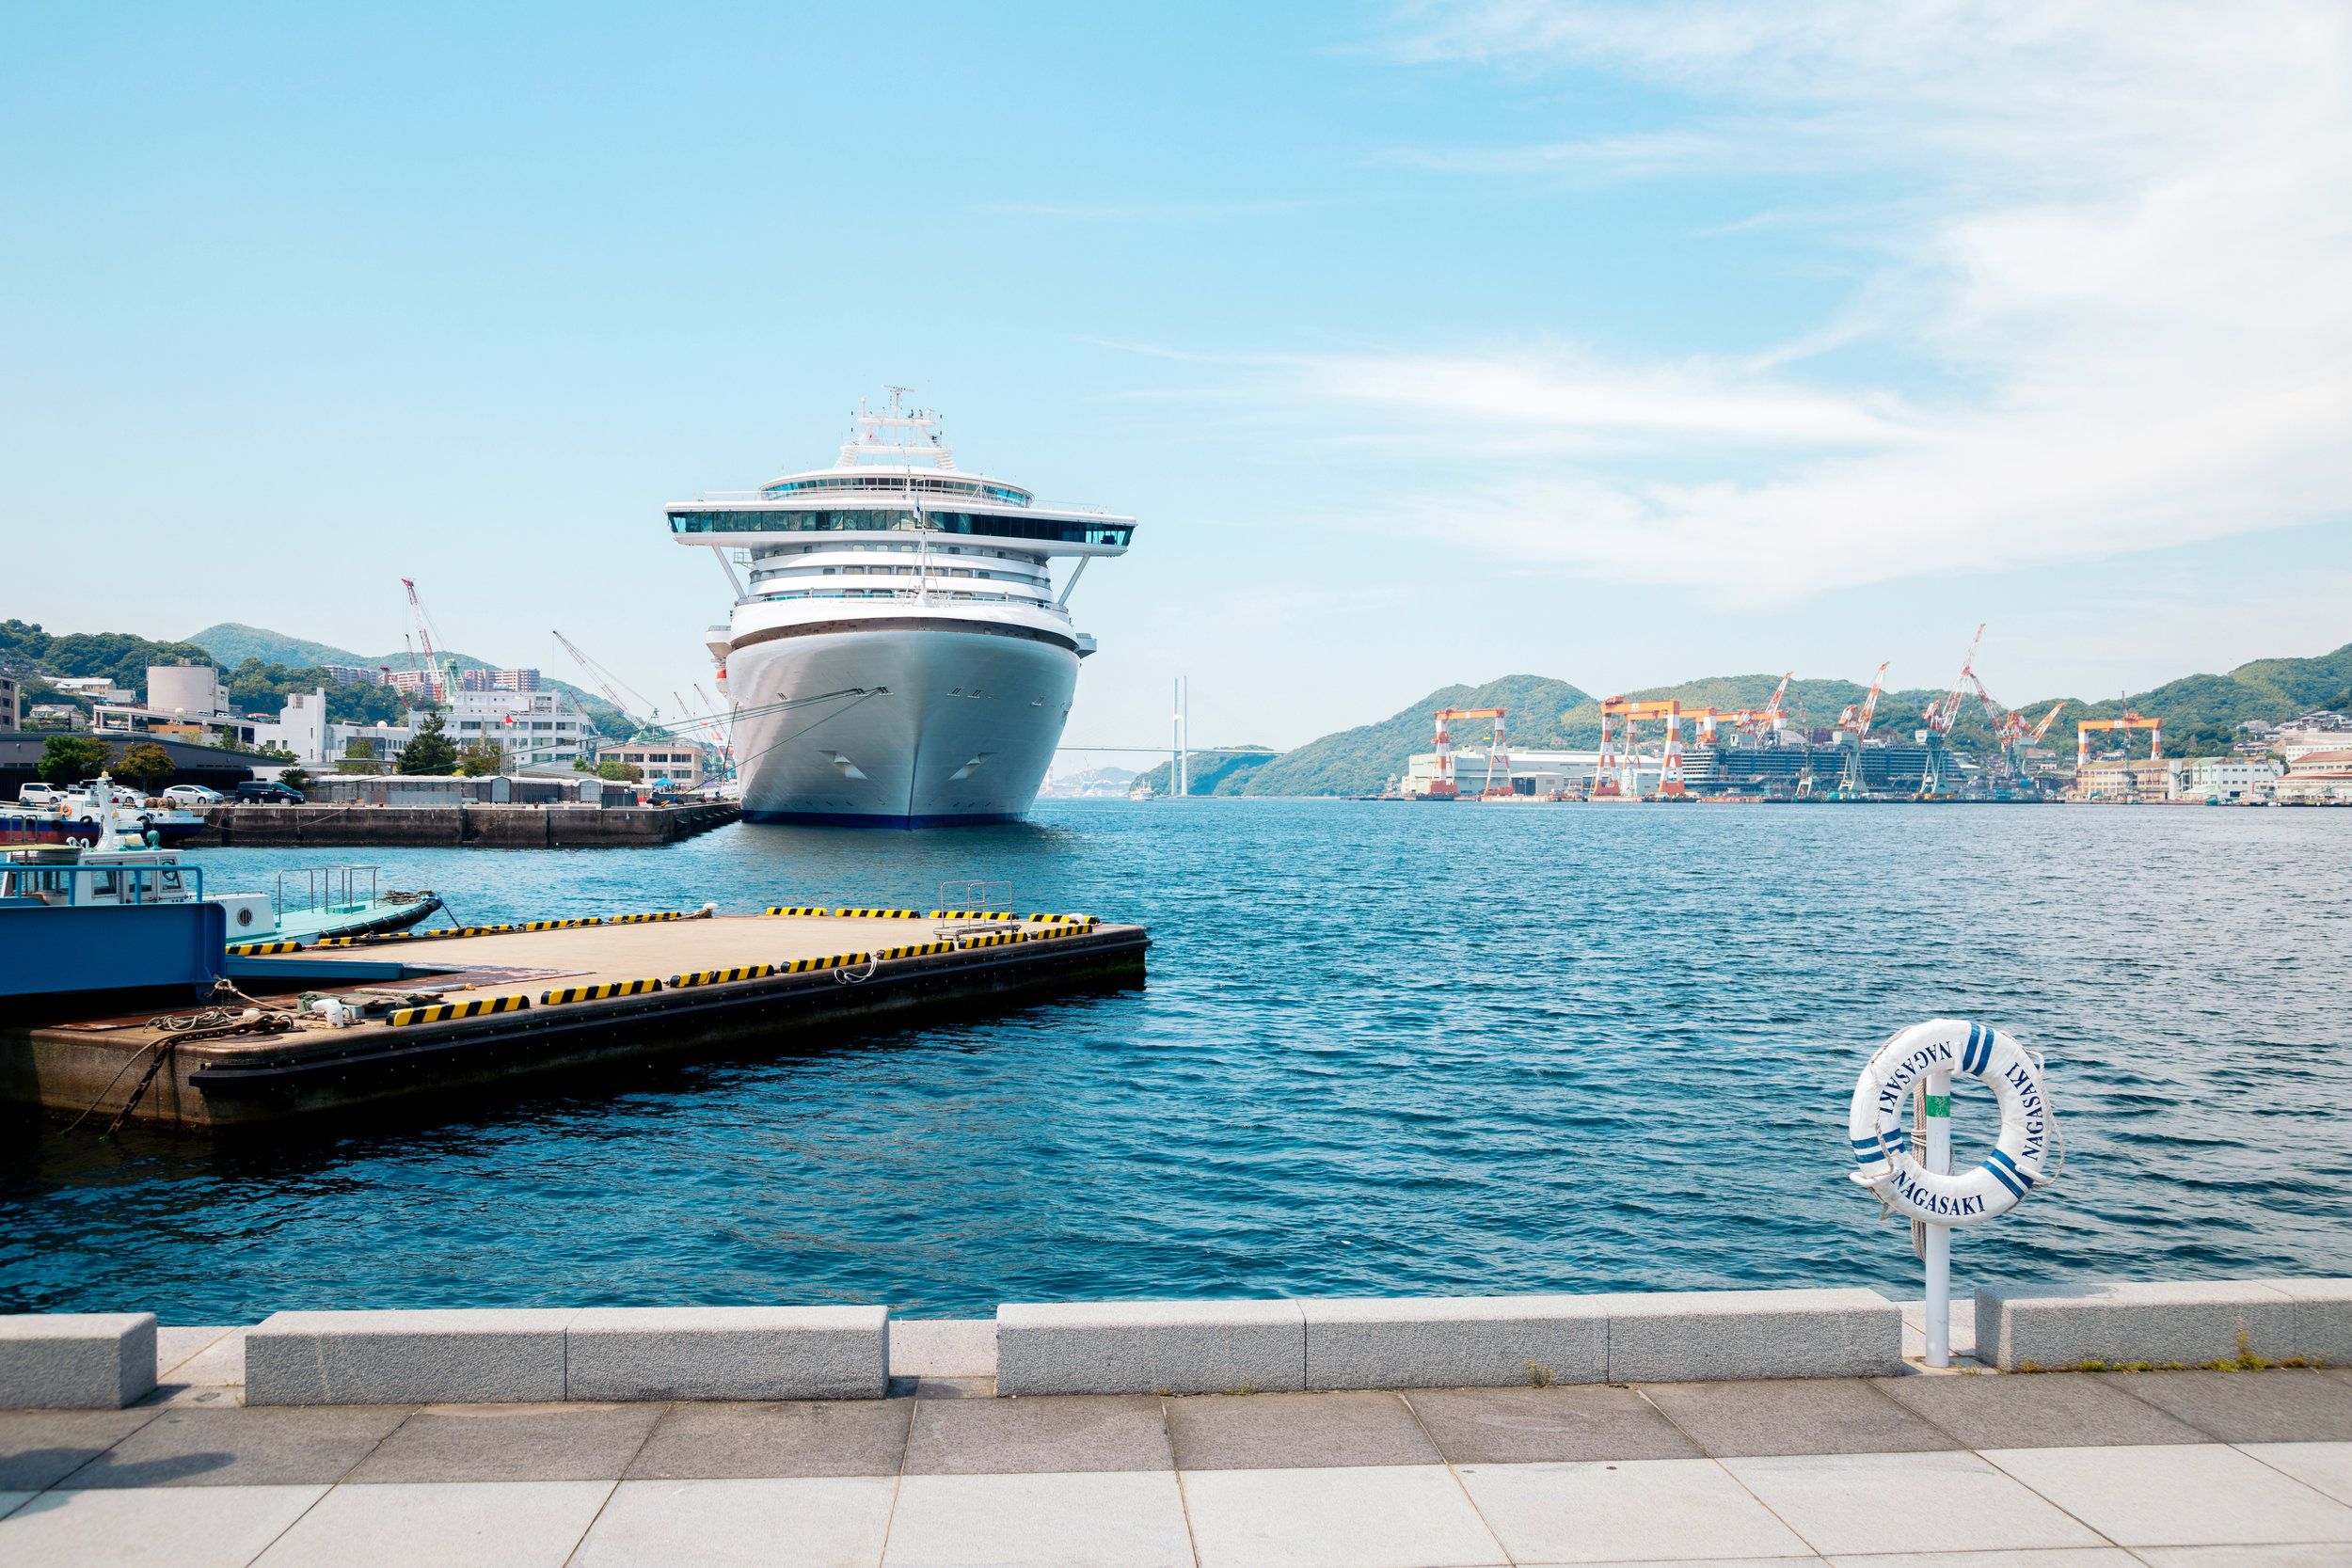 Dejima-Wharf---ocean-view-of-Nagasaki-port-at-summer-day-in-Japan-923994492_3869x2579.jpeg